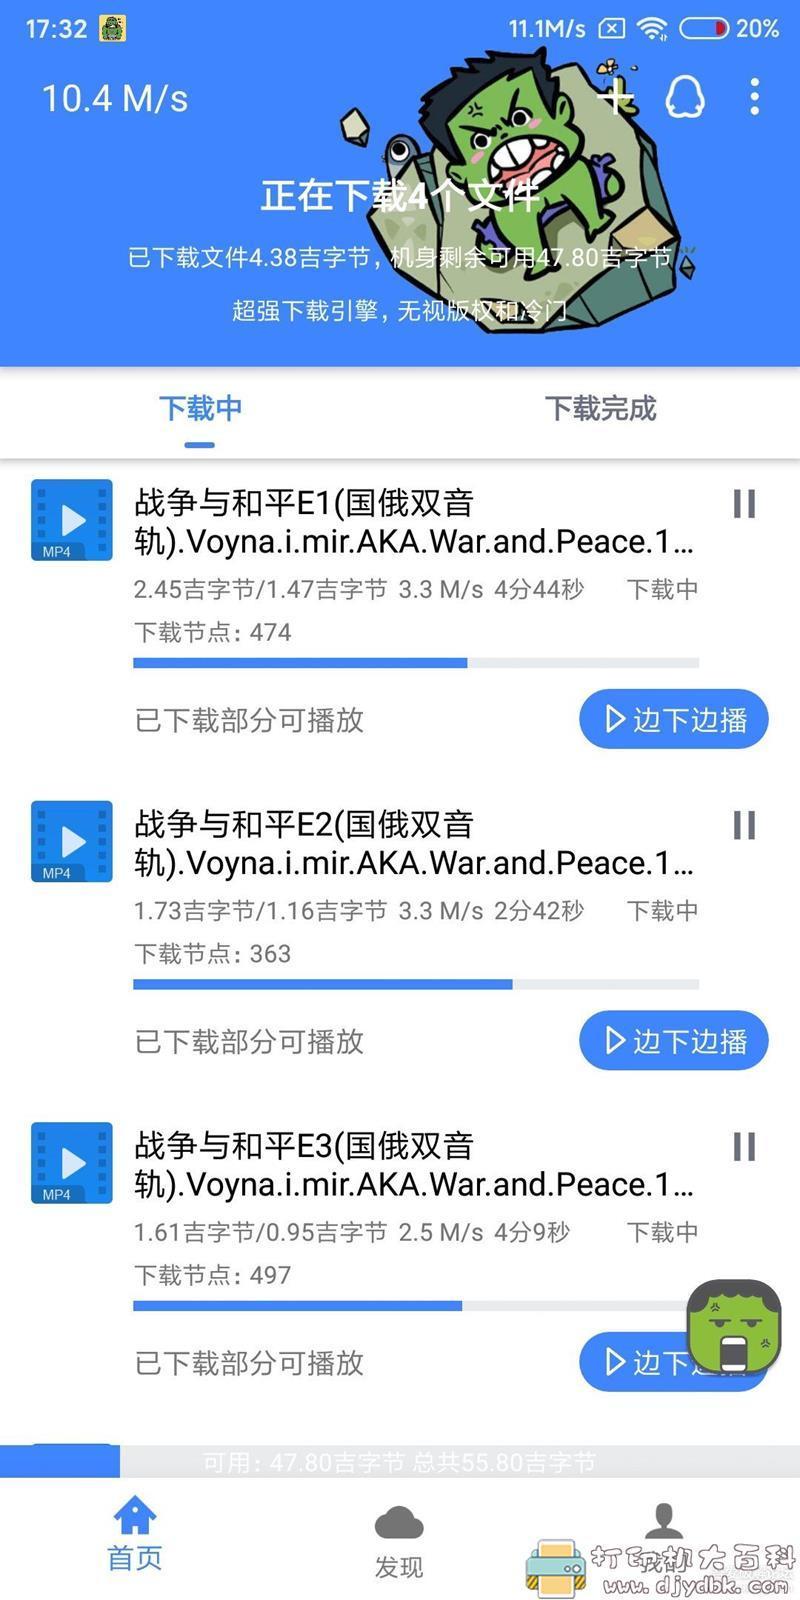 [Android]浩克下载 v1.09 [无视版权],下载冷门磁力有奇效 配图 No.1